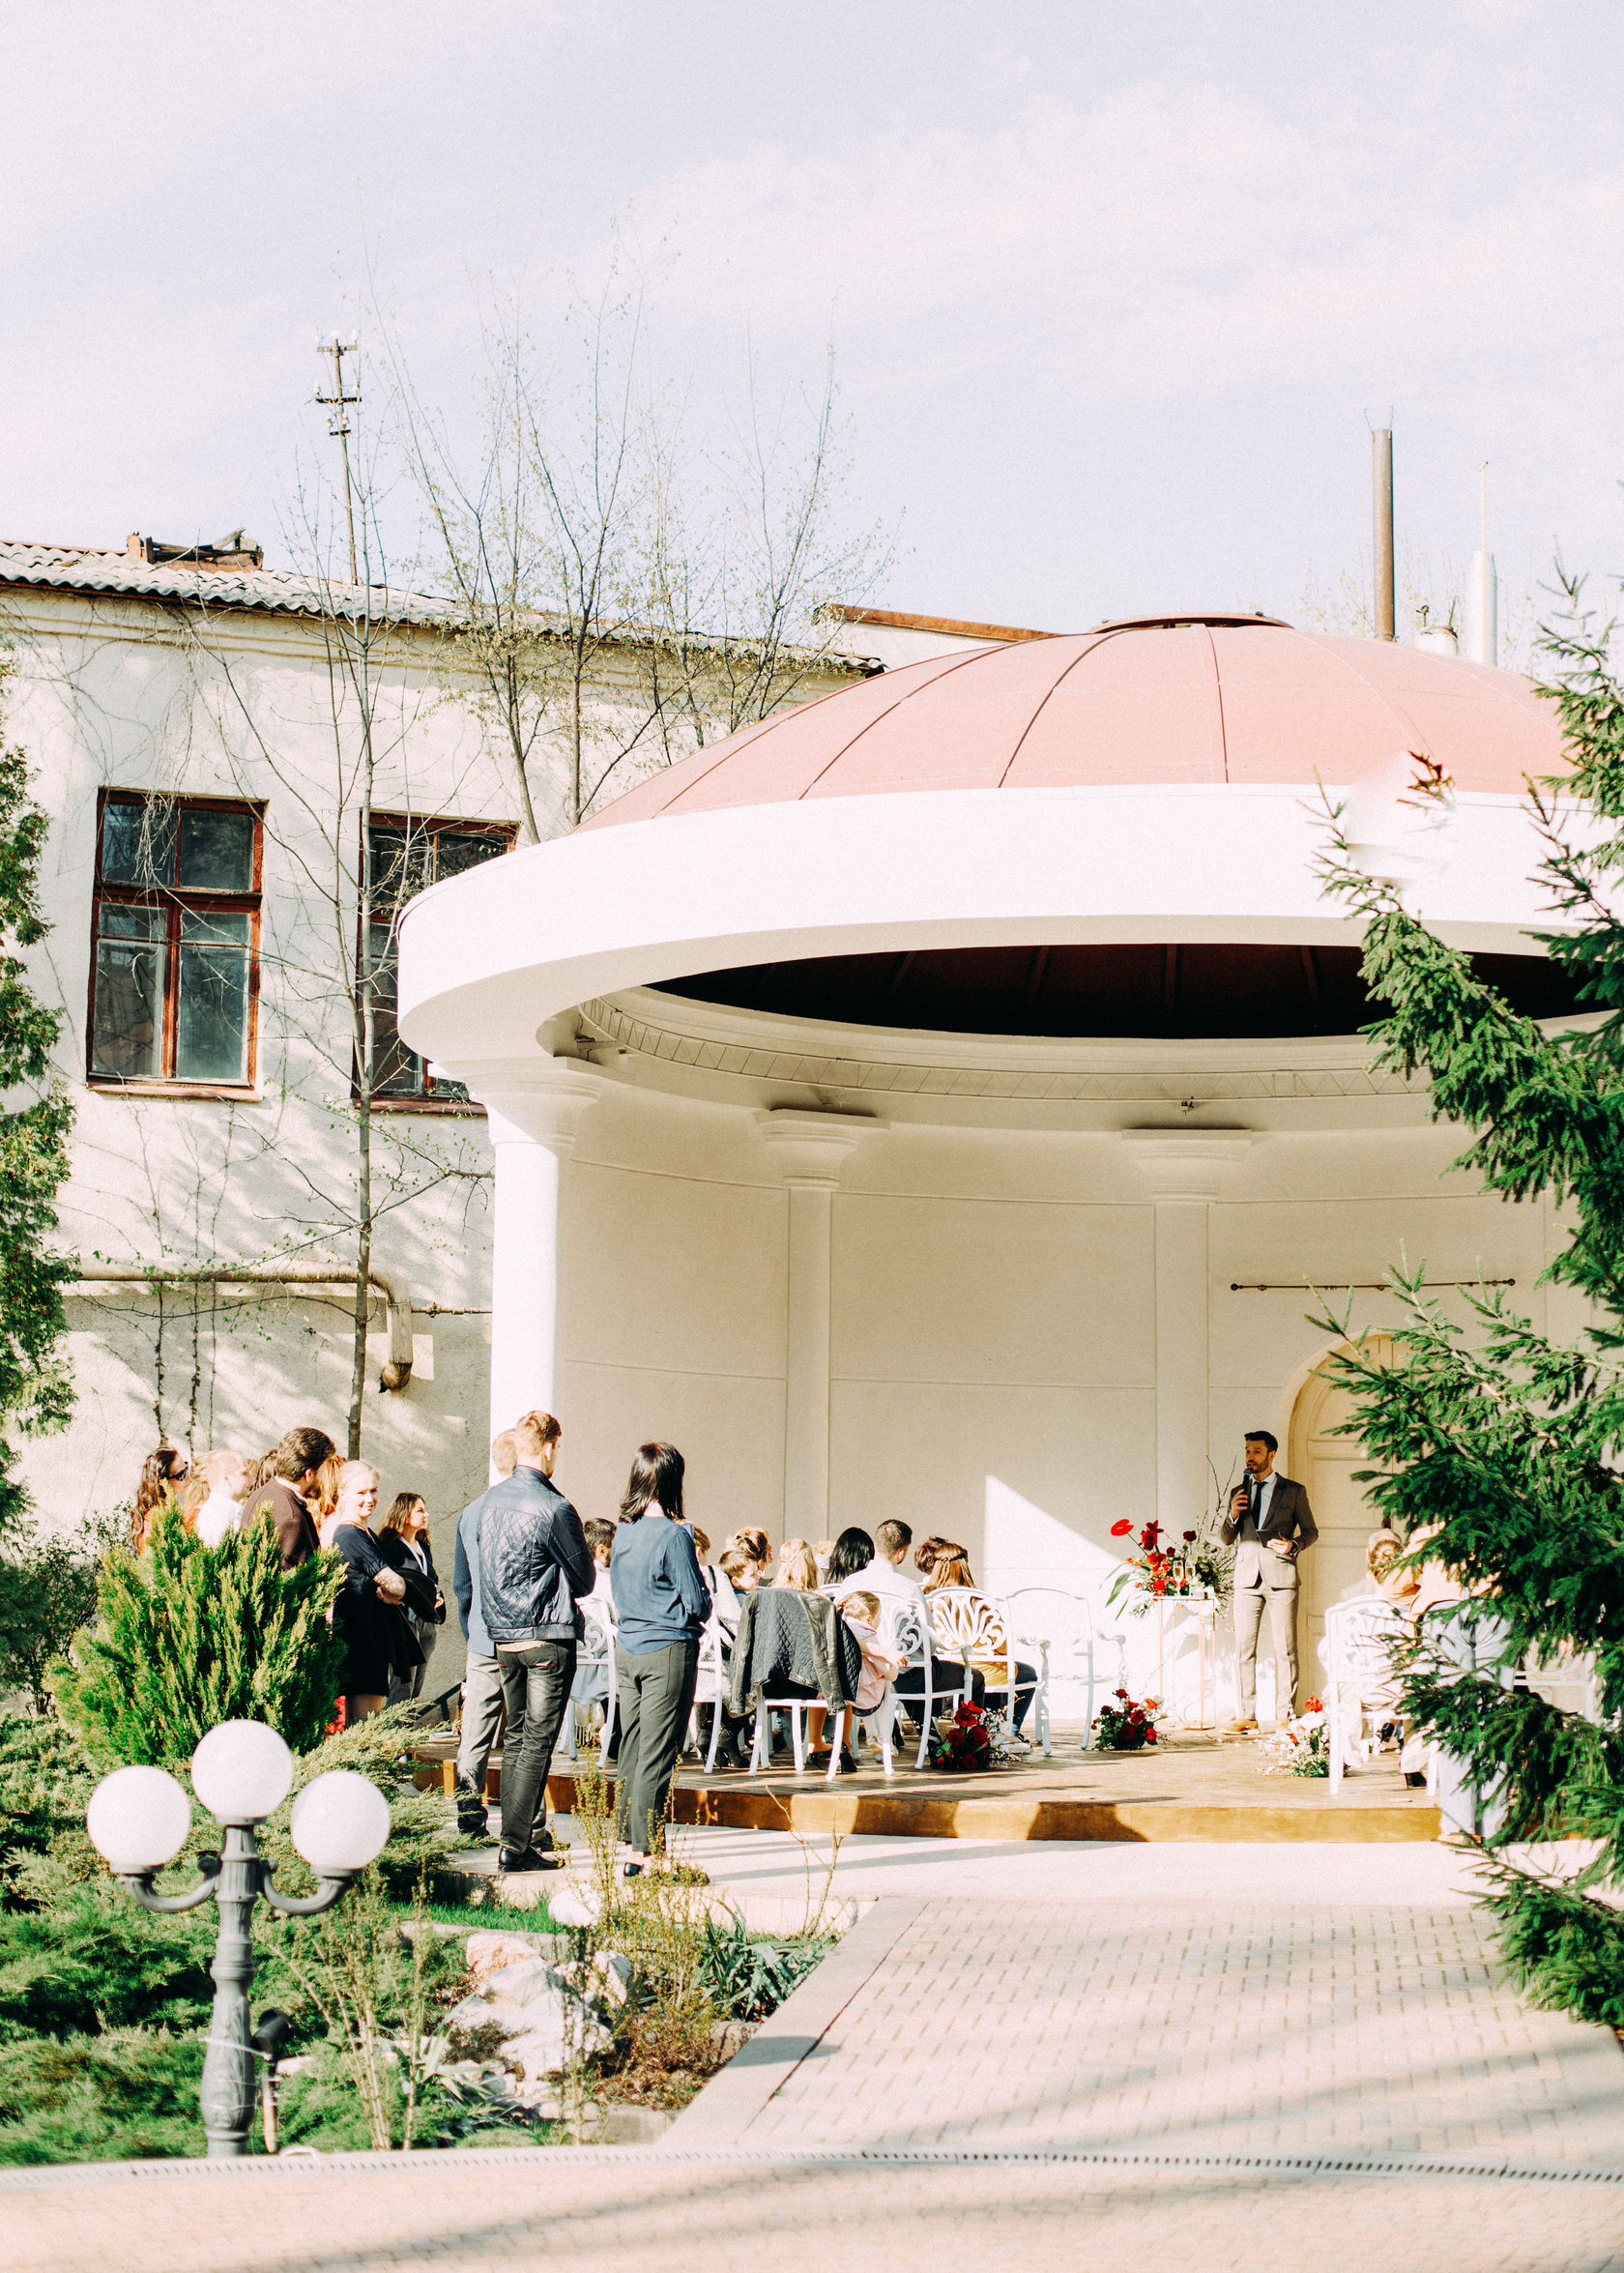 Restoran V Centre Harkova Horoshee Mesto Kitchen Bar